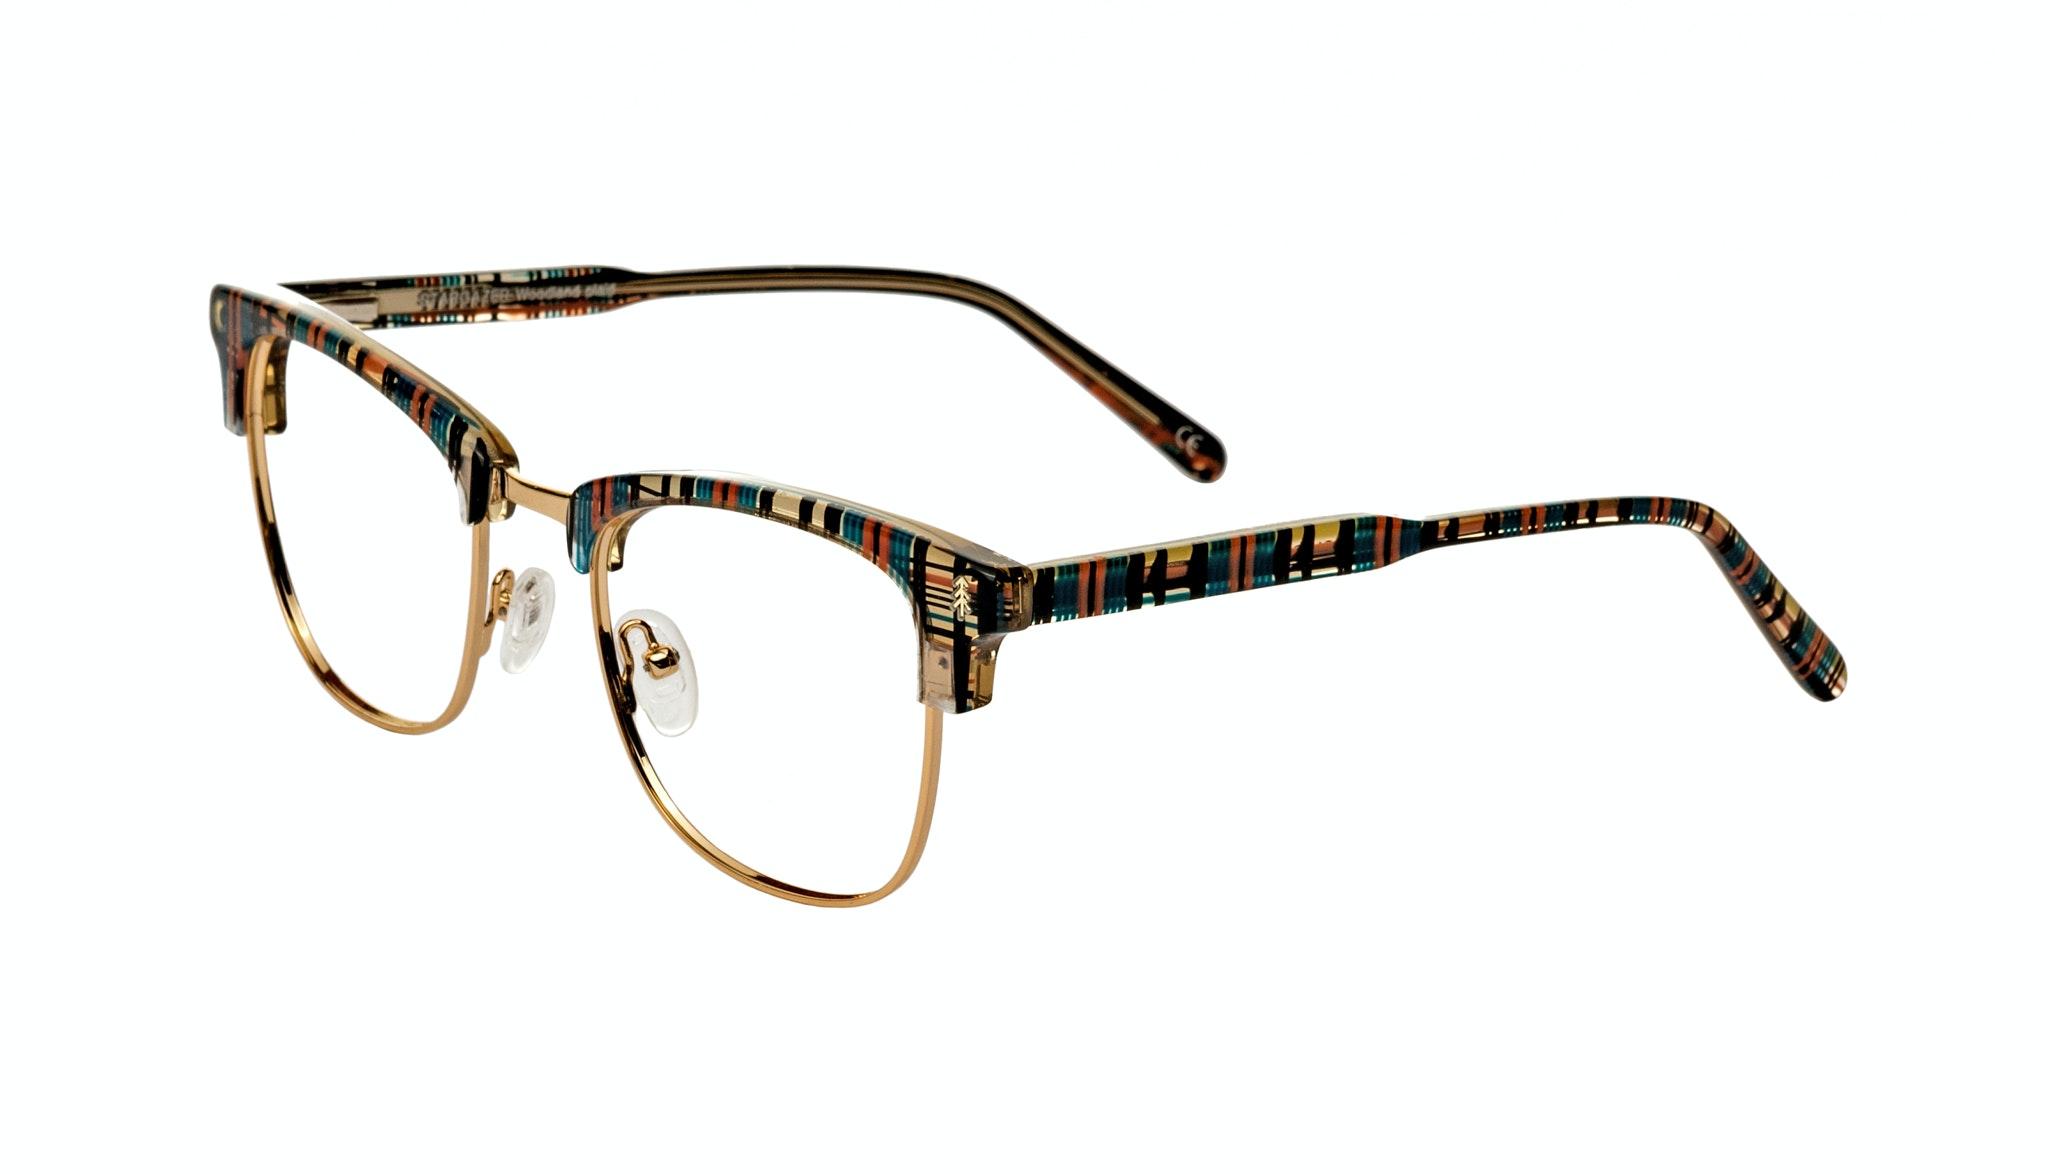 Affordable Fashion Glasses Rectangle Square Eyeglasses Women Stargazer Woodland Plaid Tilt